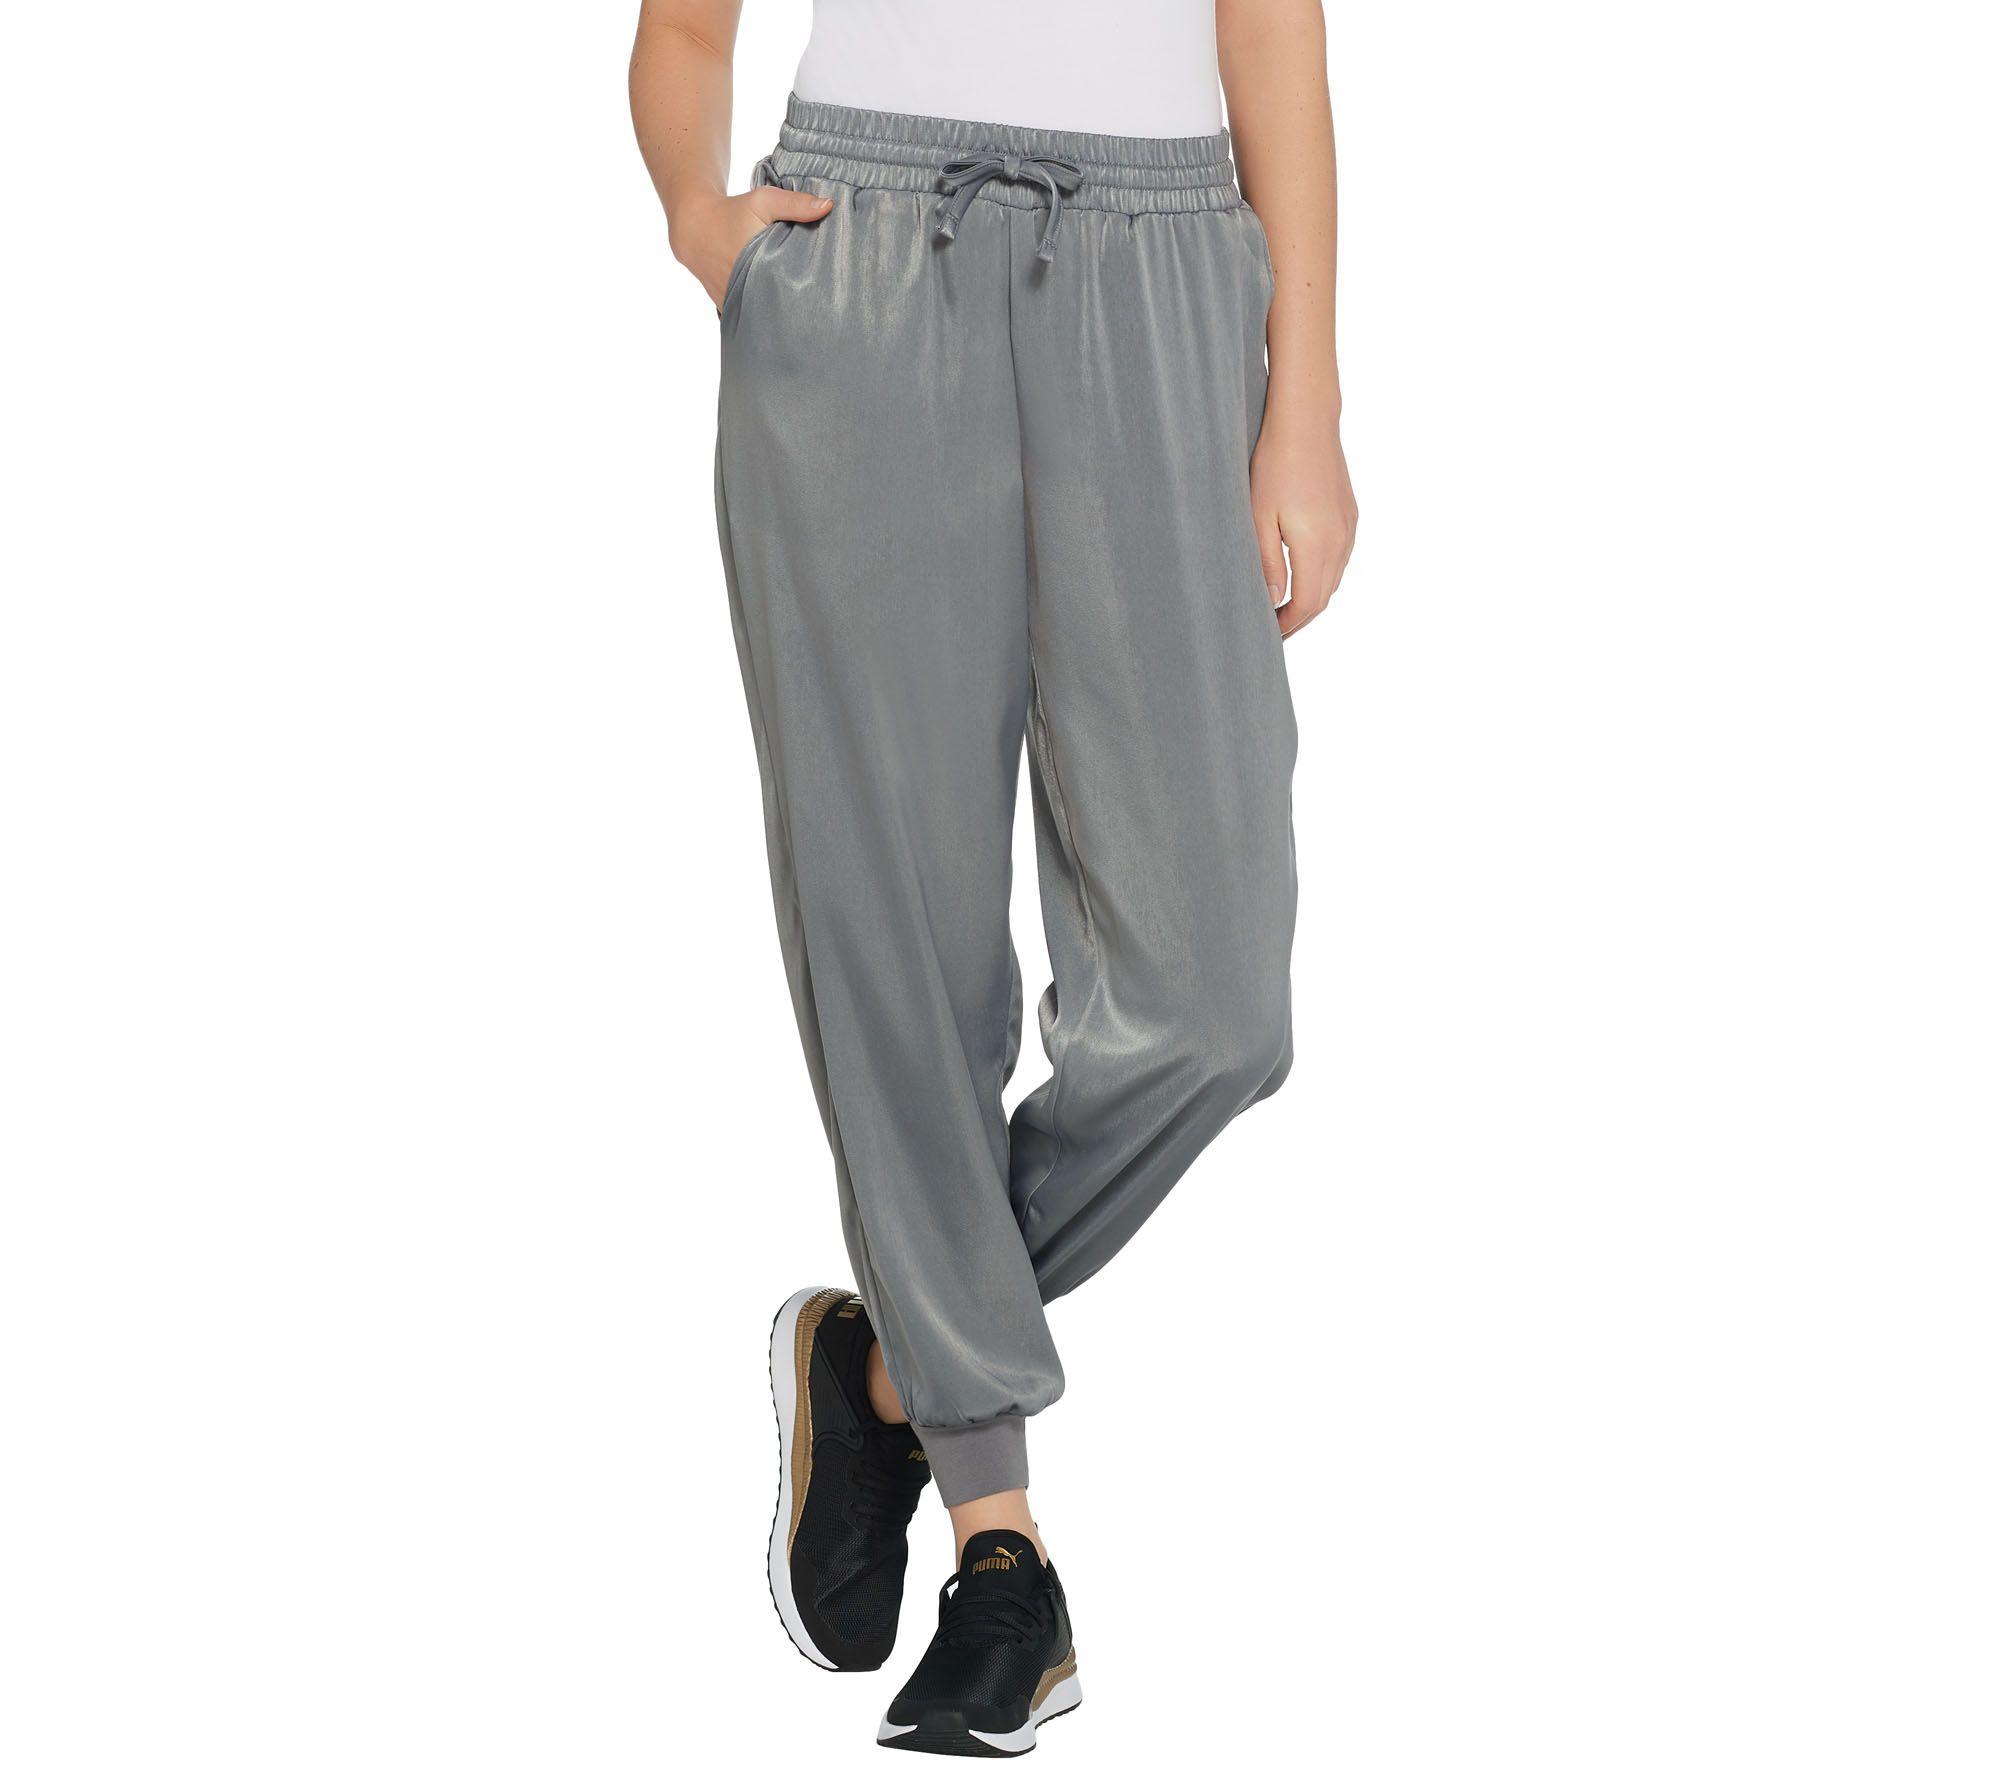 AnyBody Loungewear Tall Satin Jogger Pants - A345515